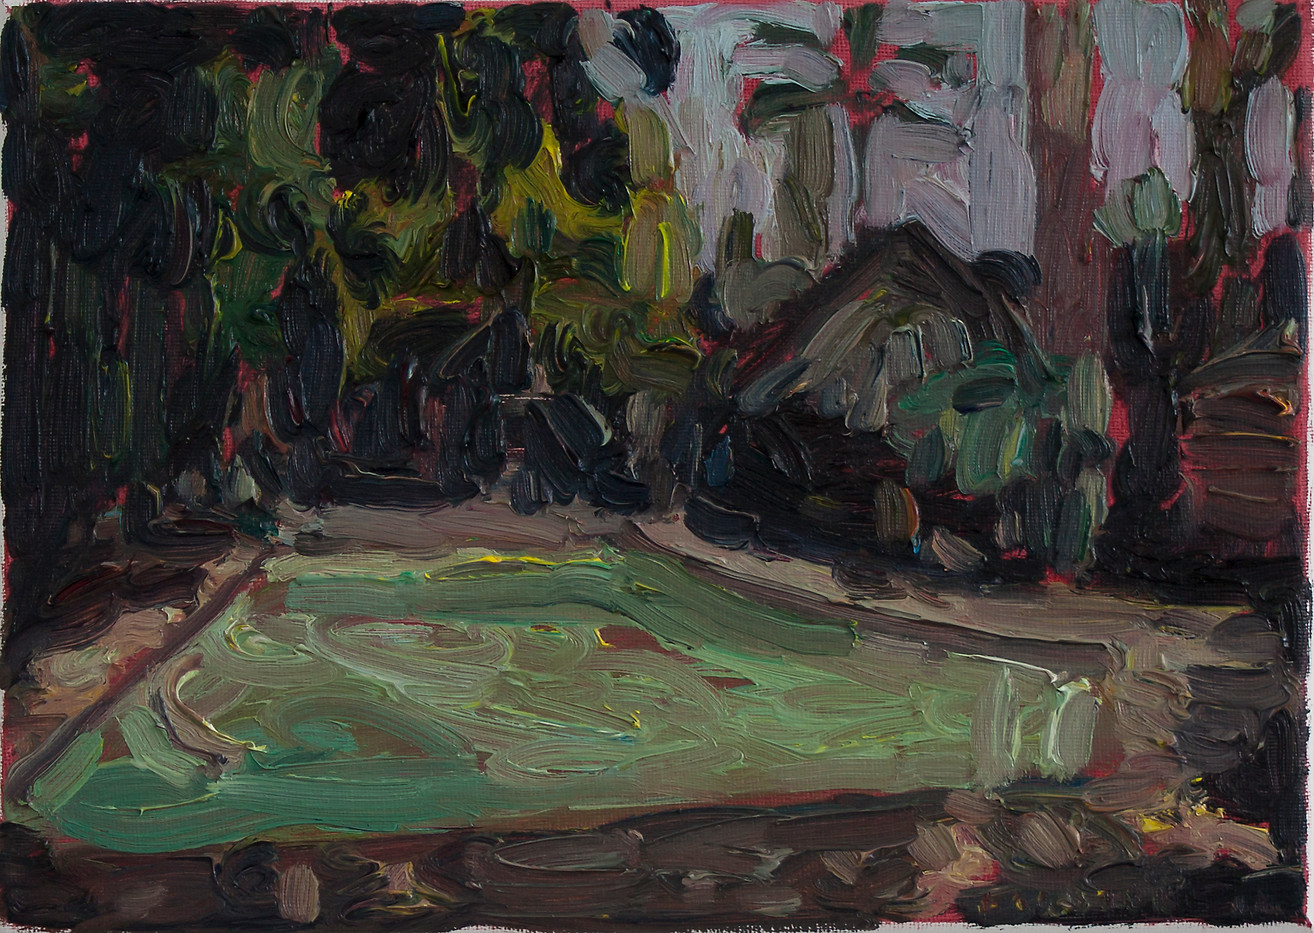 Anton Karstel | Property (Faerie Glen) | 2014 | Oil on Canvas | 21 x 29 cm